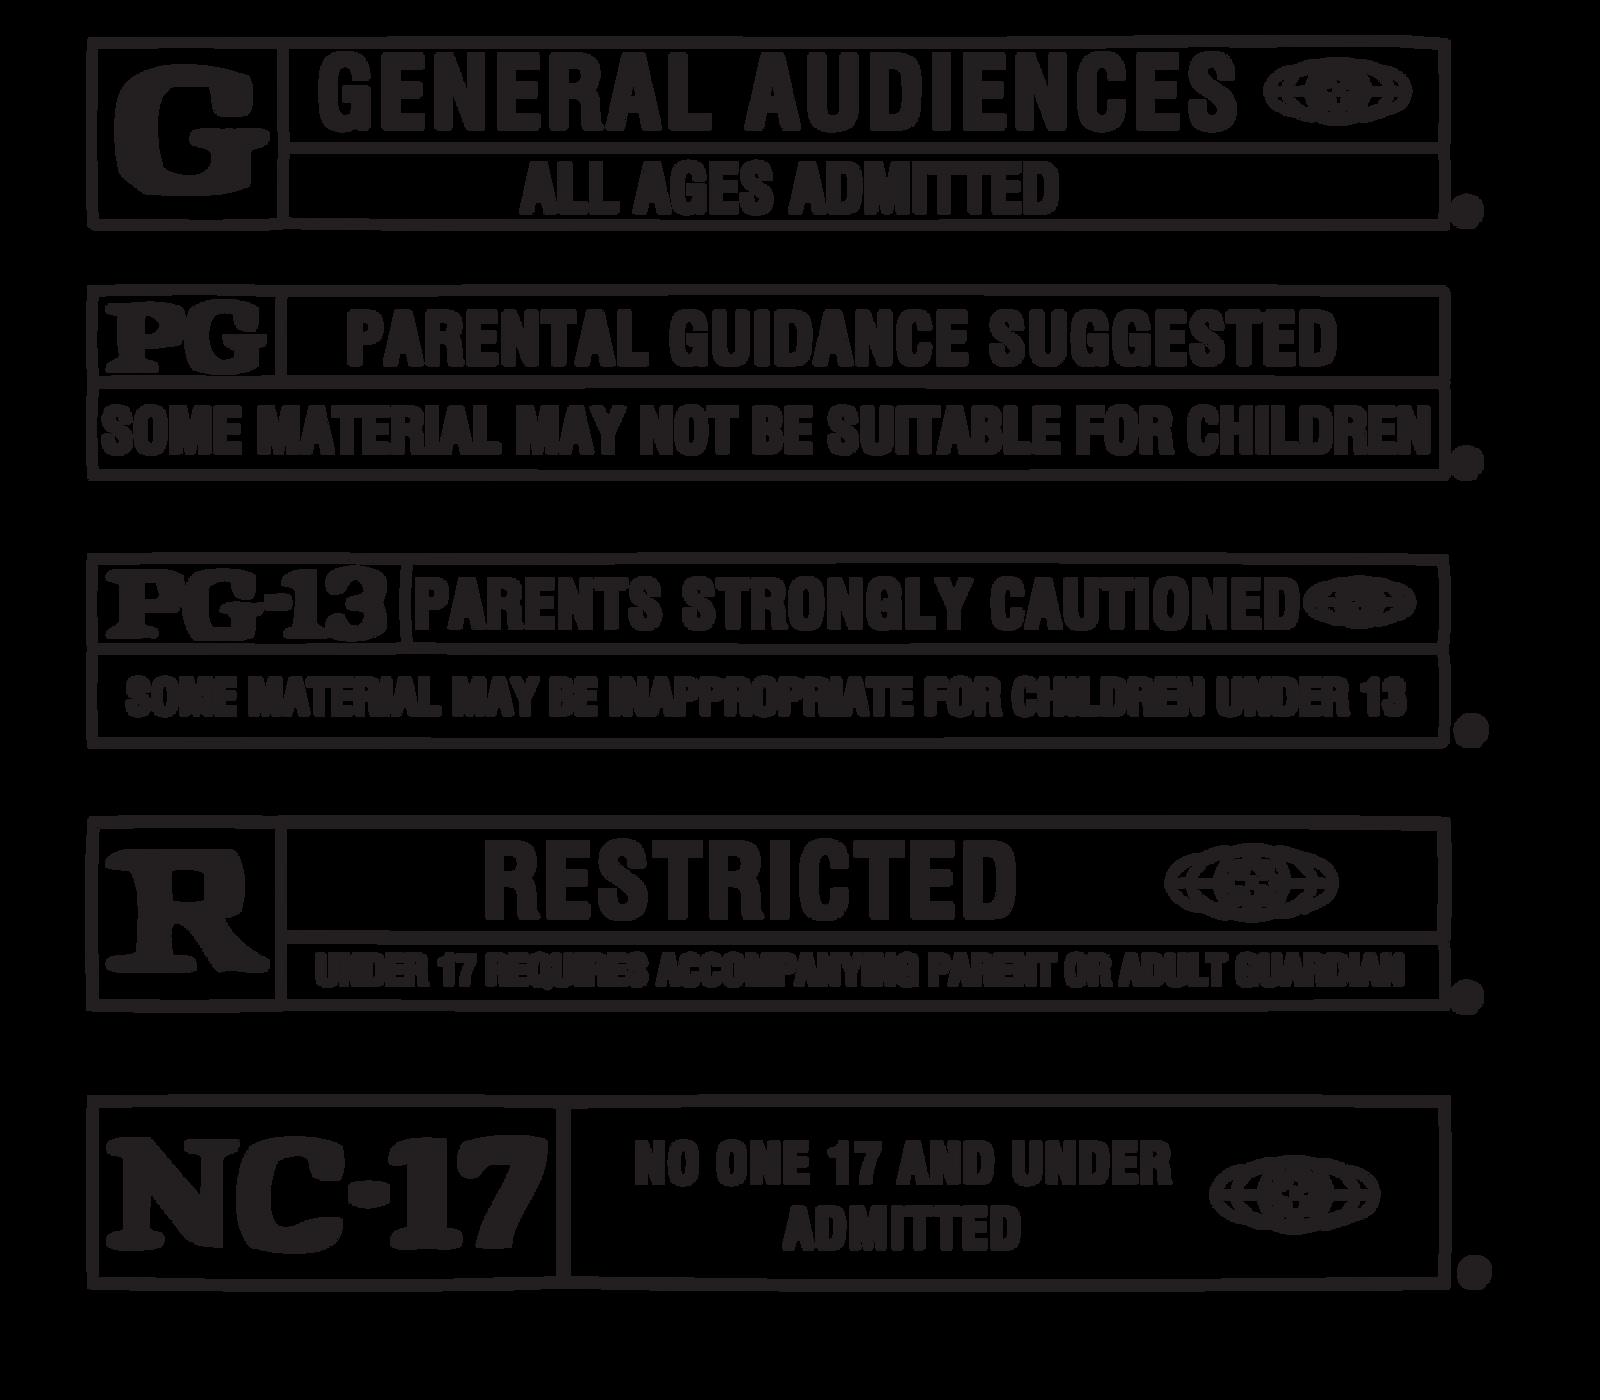 Us Movie Ratings1 Film Ratings Film Classification Parental Guidance